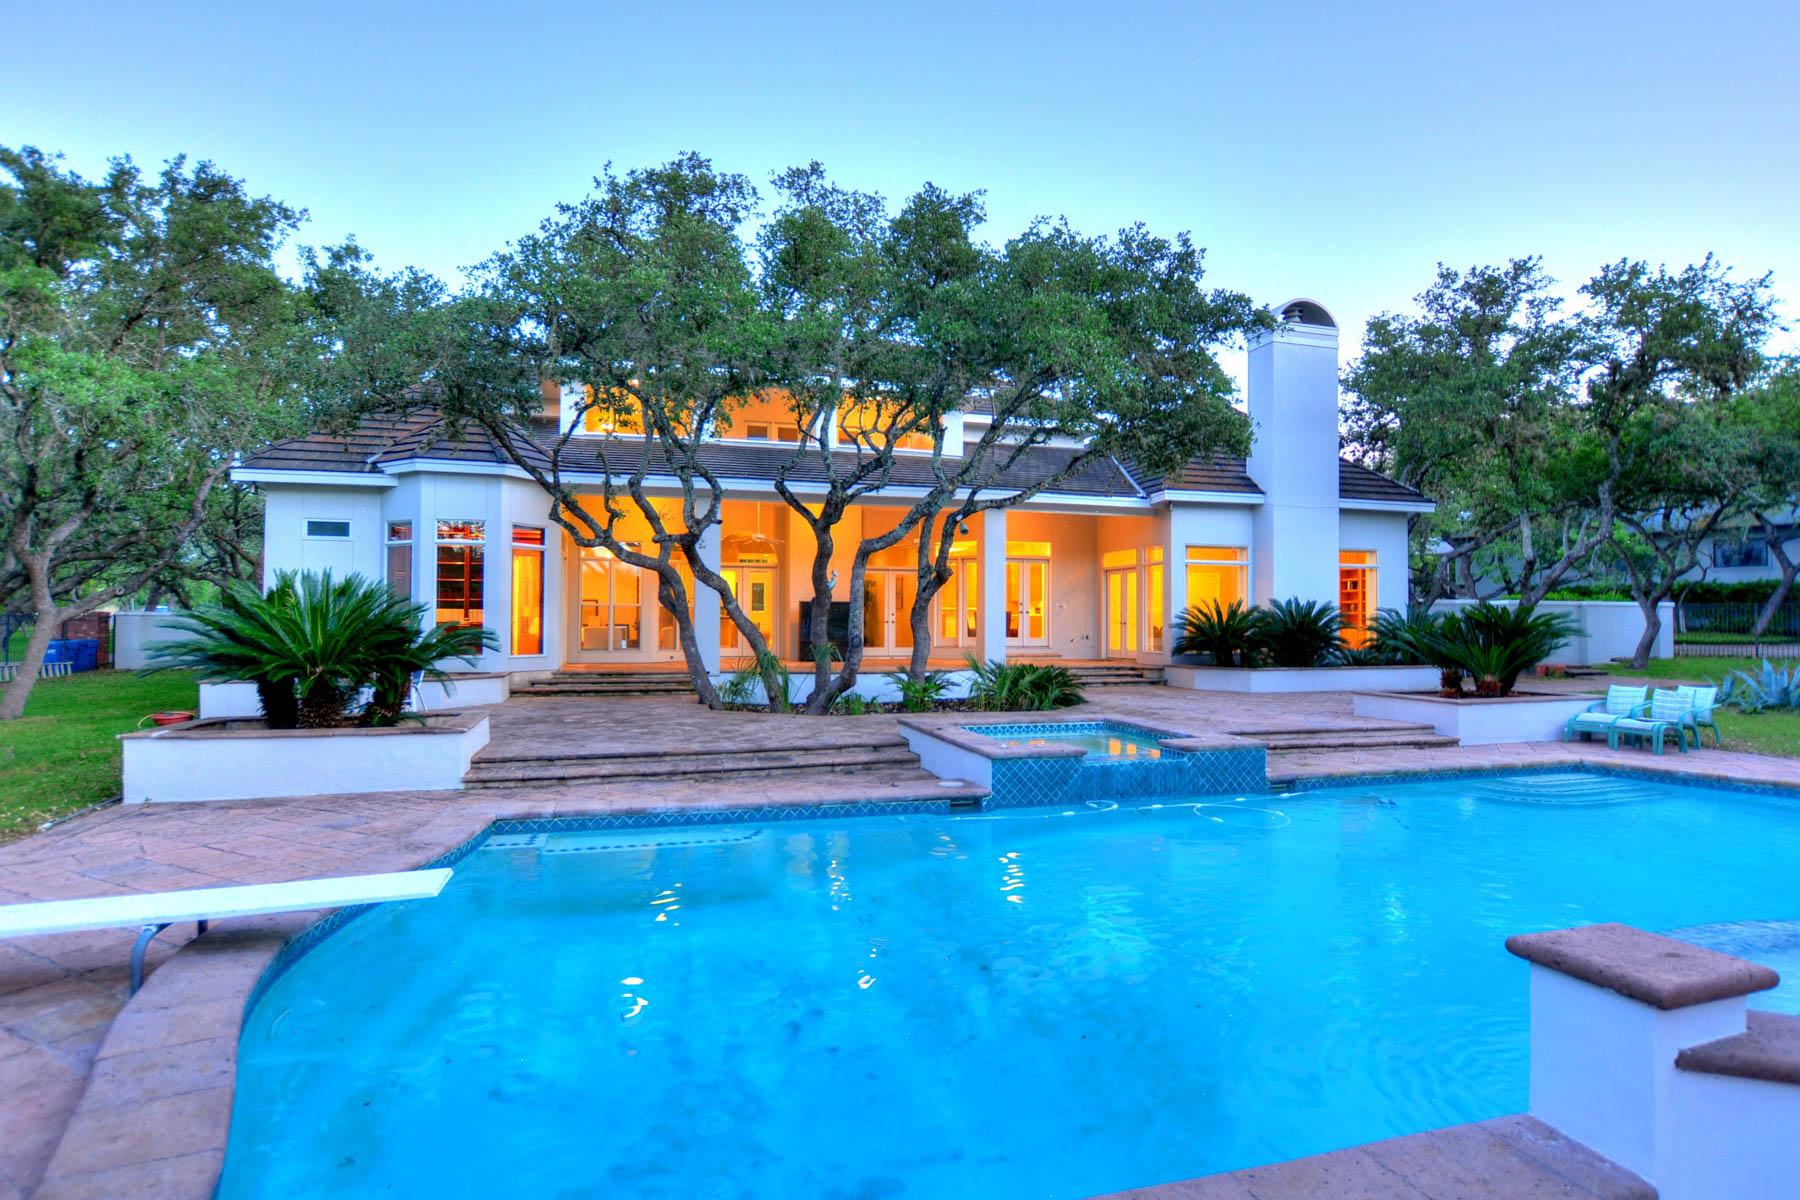 Single Family Home for Sale at Incredible Custom Home in Shavano Creek 239 Branch Oak Way Shavano Park, San Antonio, Texas, 78230 United States